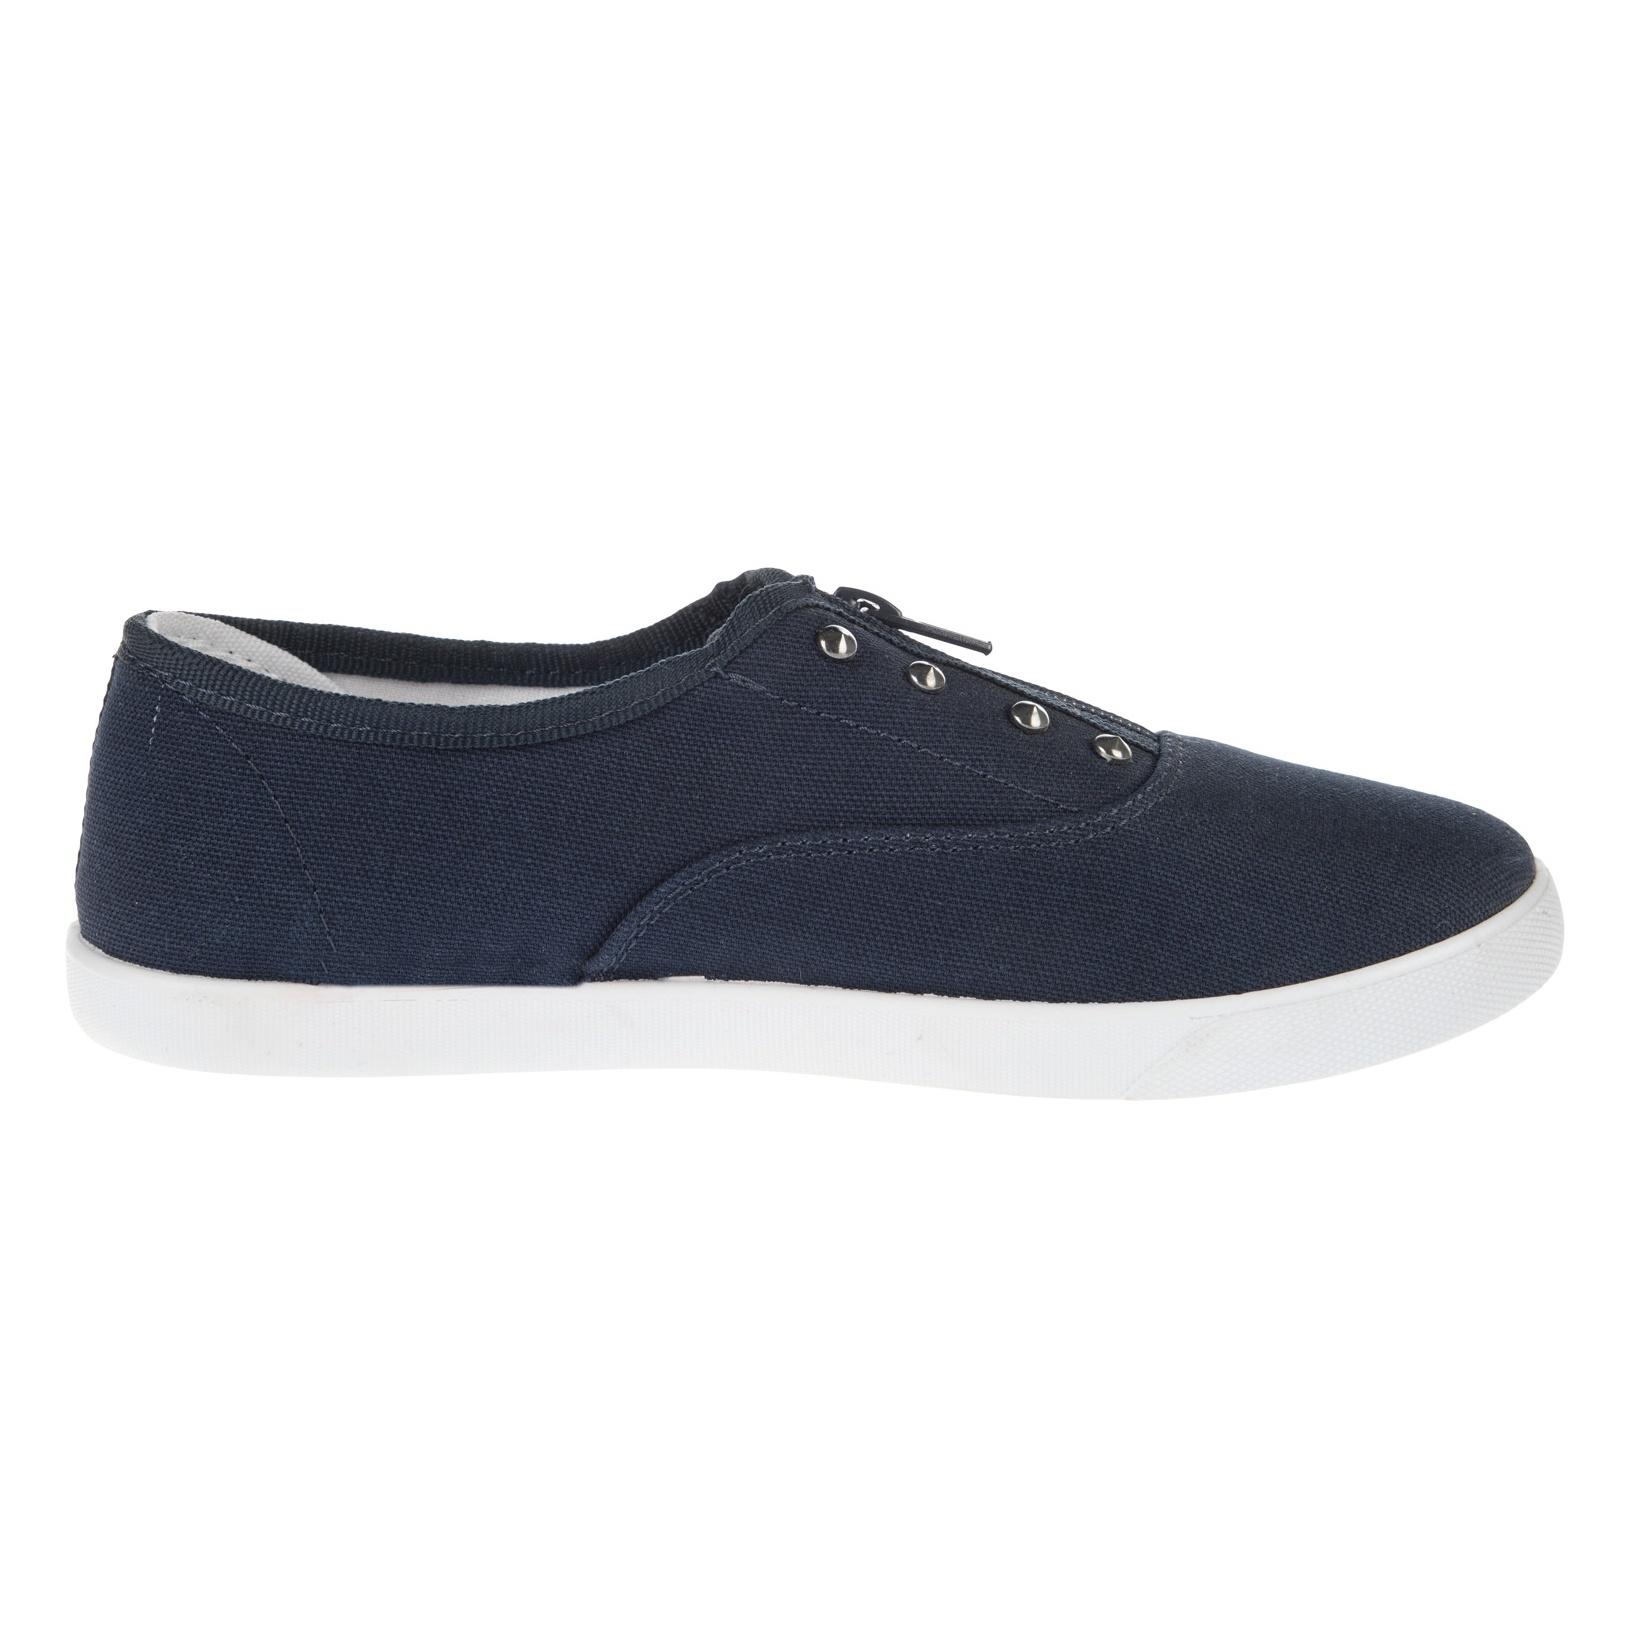 کفش روزمره نه آرت بلا مدل 100316421-113